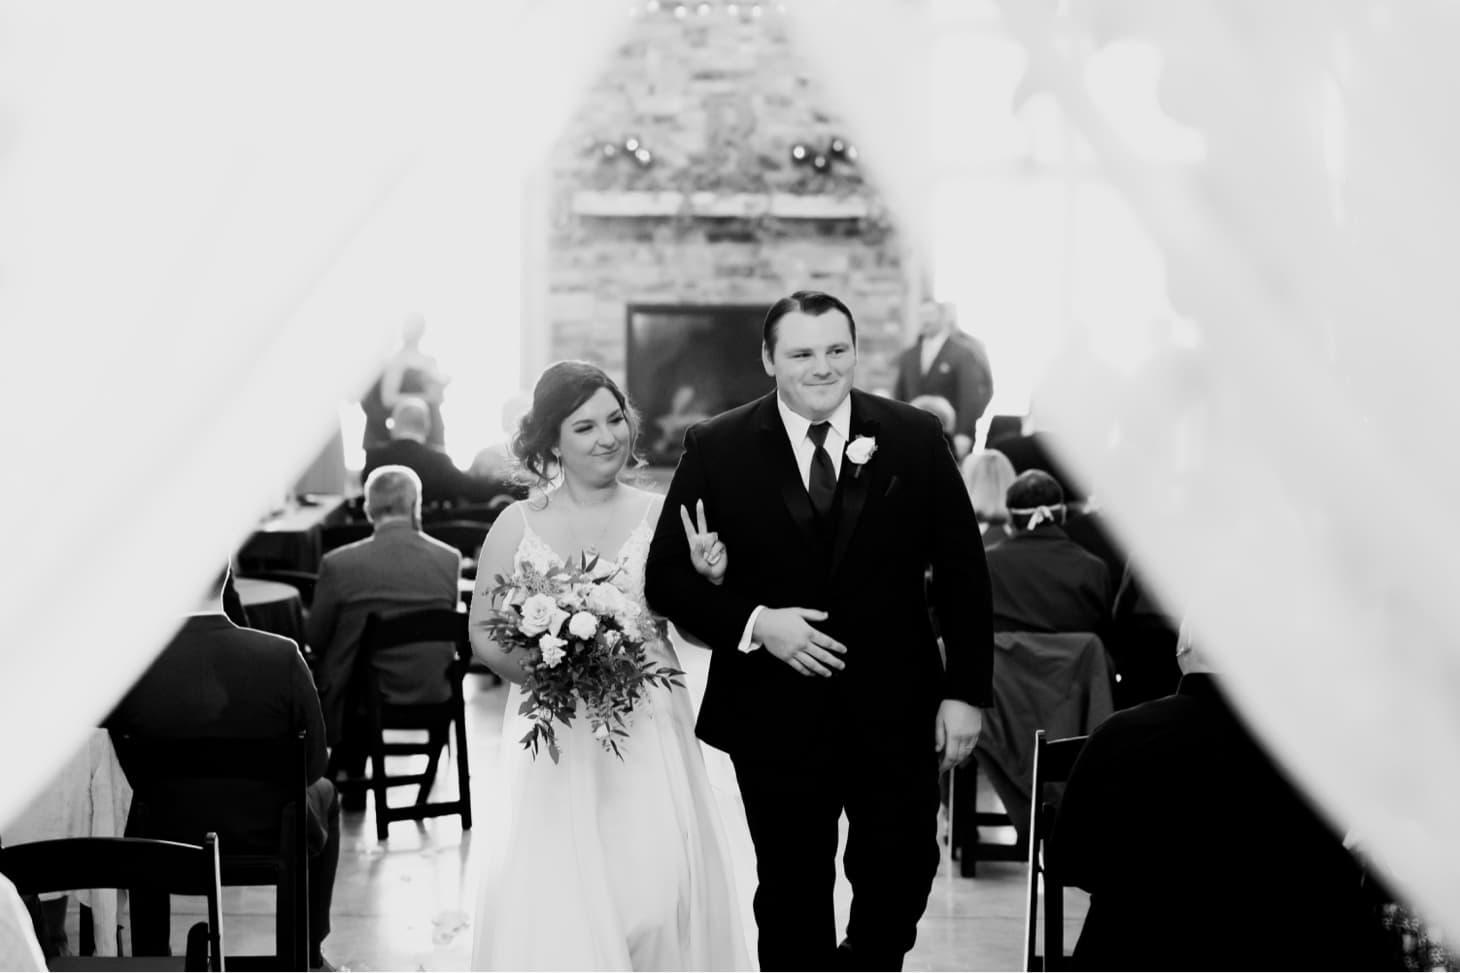 wedding exit at country lane lodge adel iowa